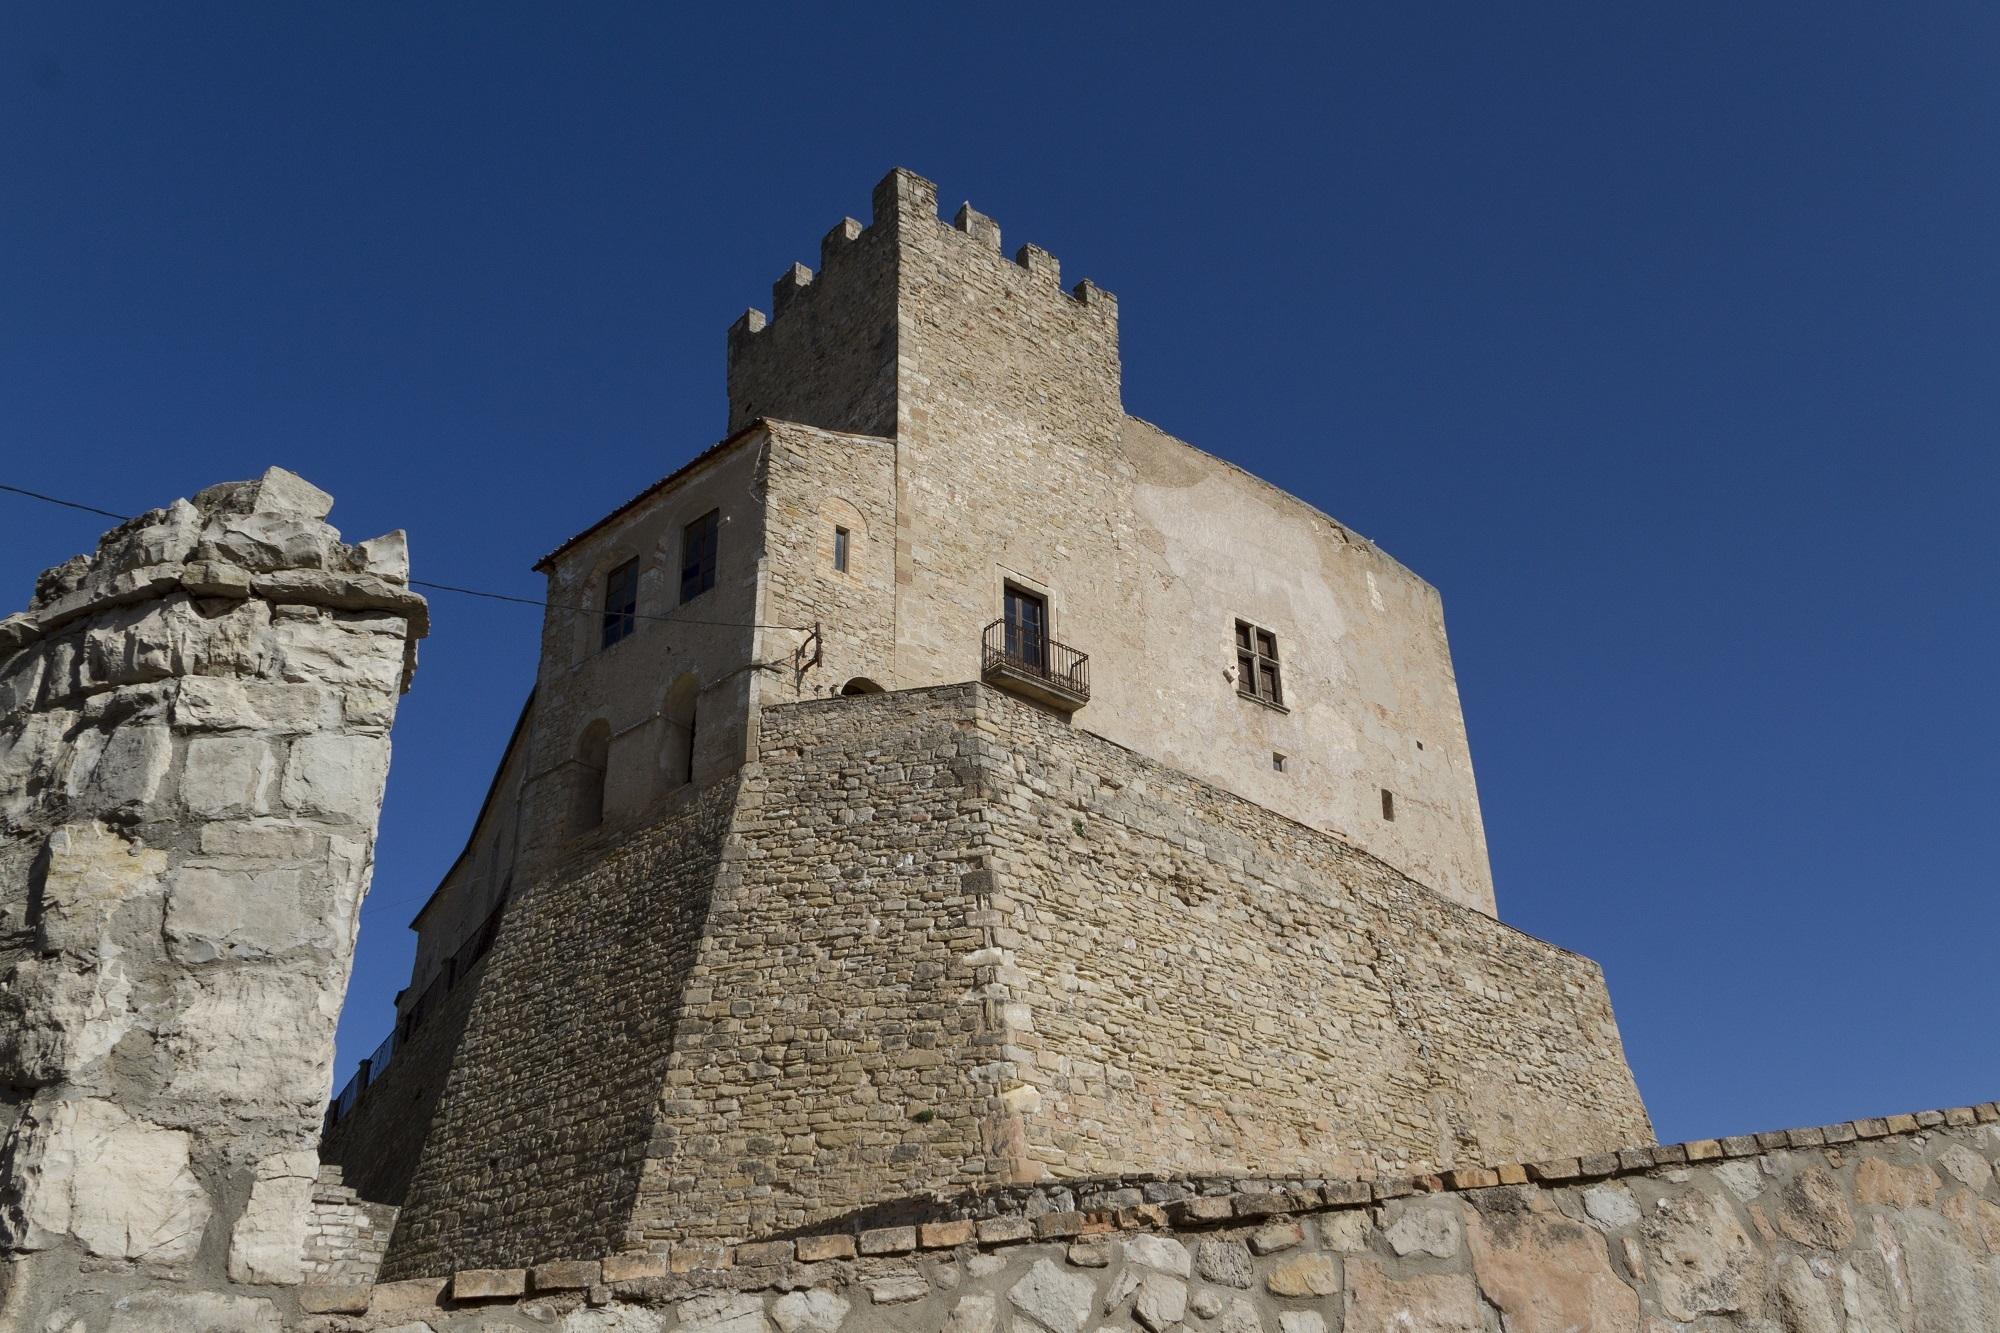 De castell en castell